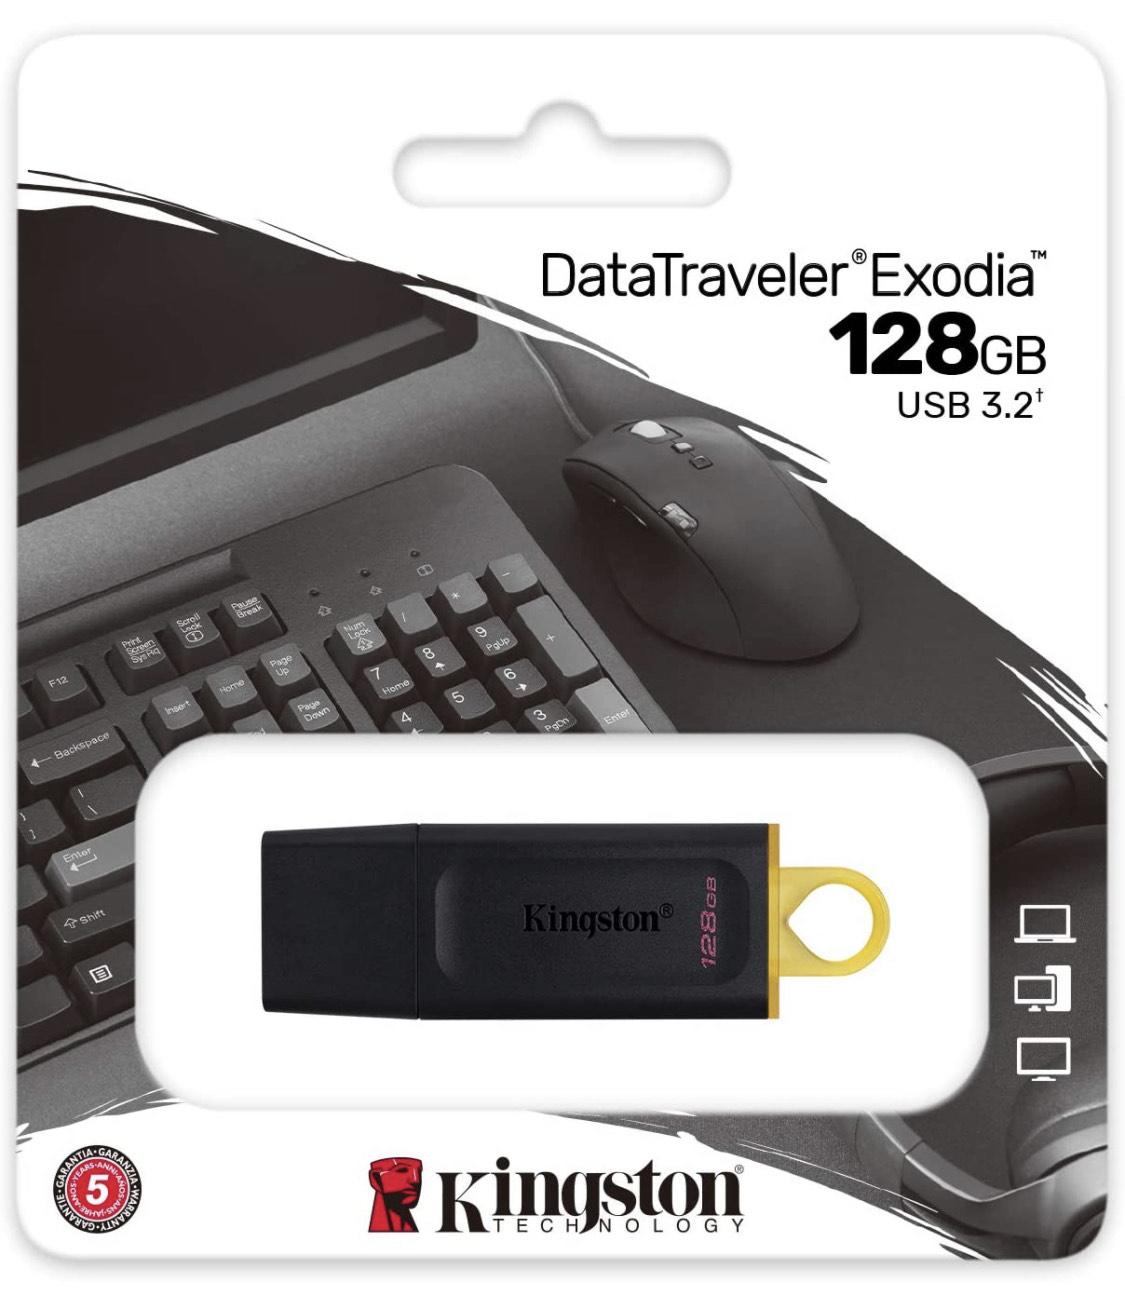 Kingston DataTraveler Exodia DTX/128GB Flash Drive USB 3.2 - £11.49 (+£4.49 non-Prime) @ Amazon